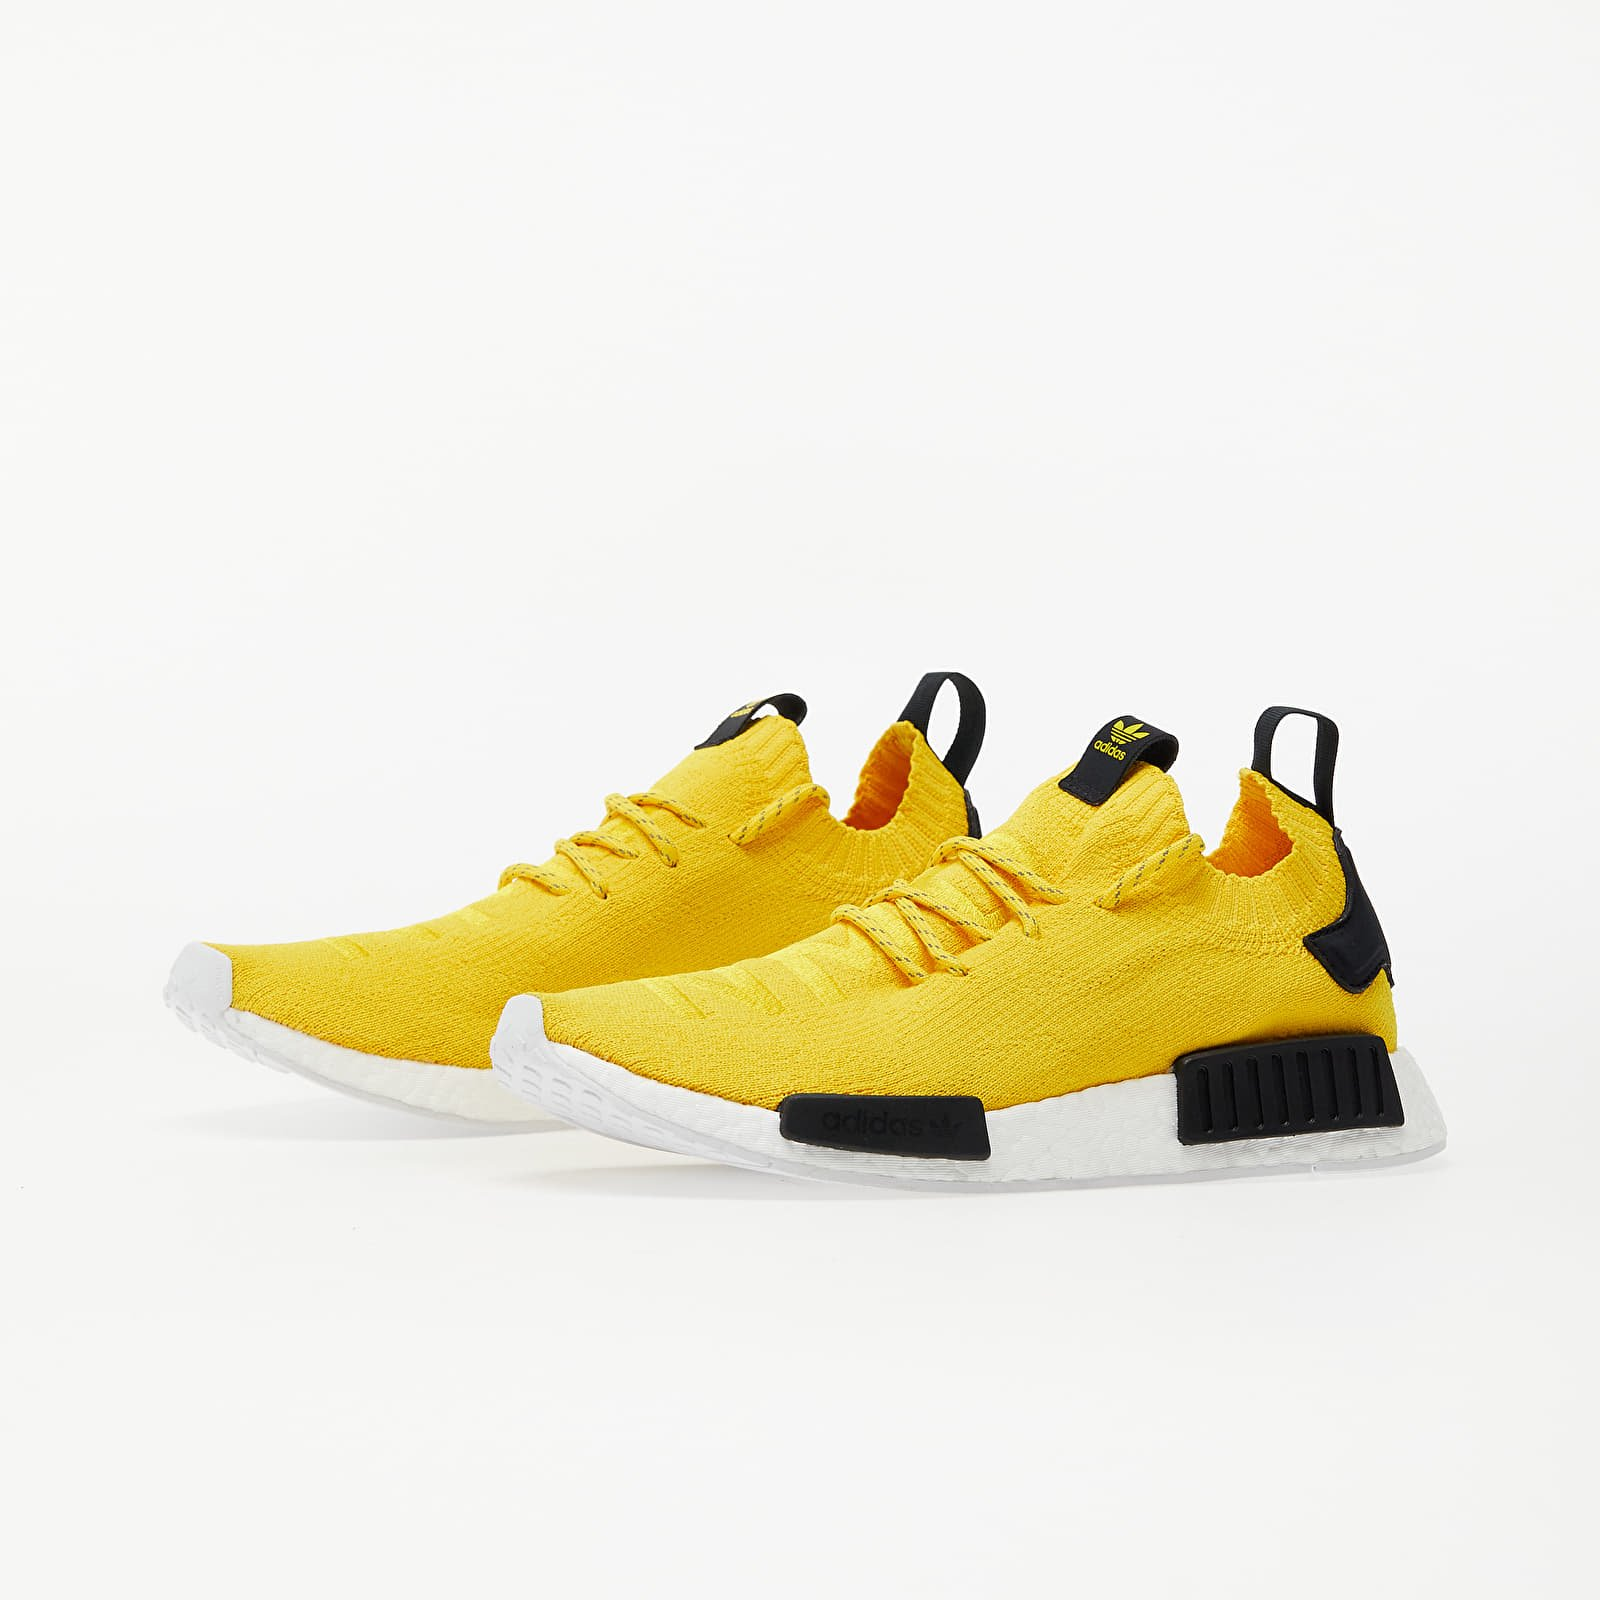 adidas NMD_R1 PrimeknitEqt Yellow/ Eqt Yellow/ Core Black